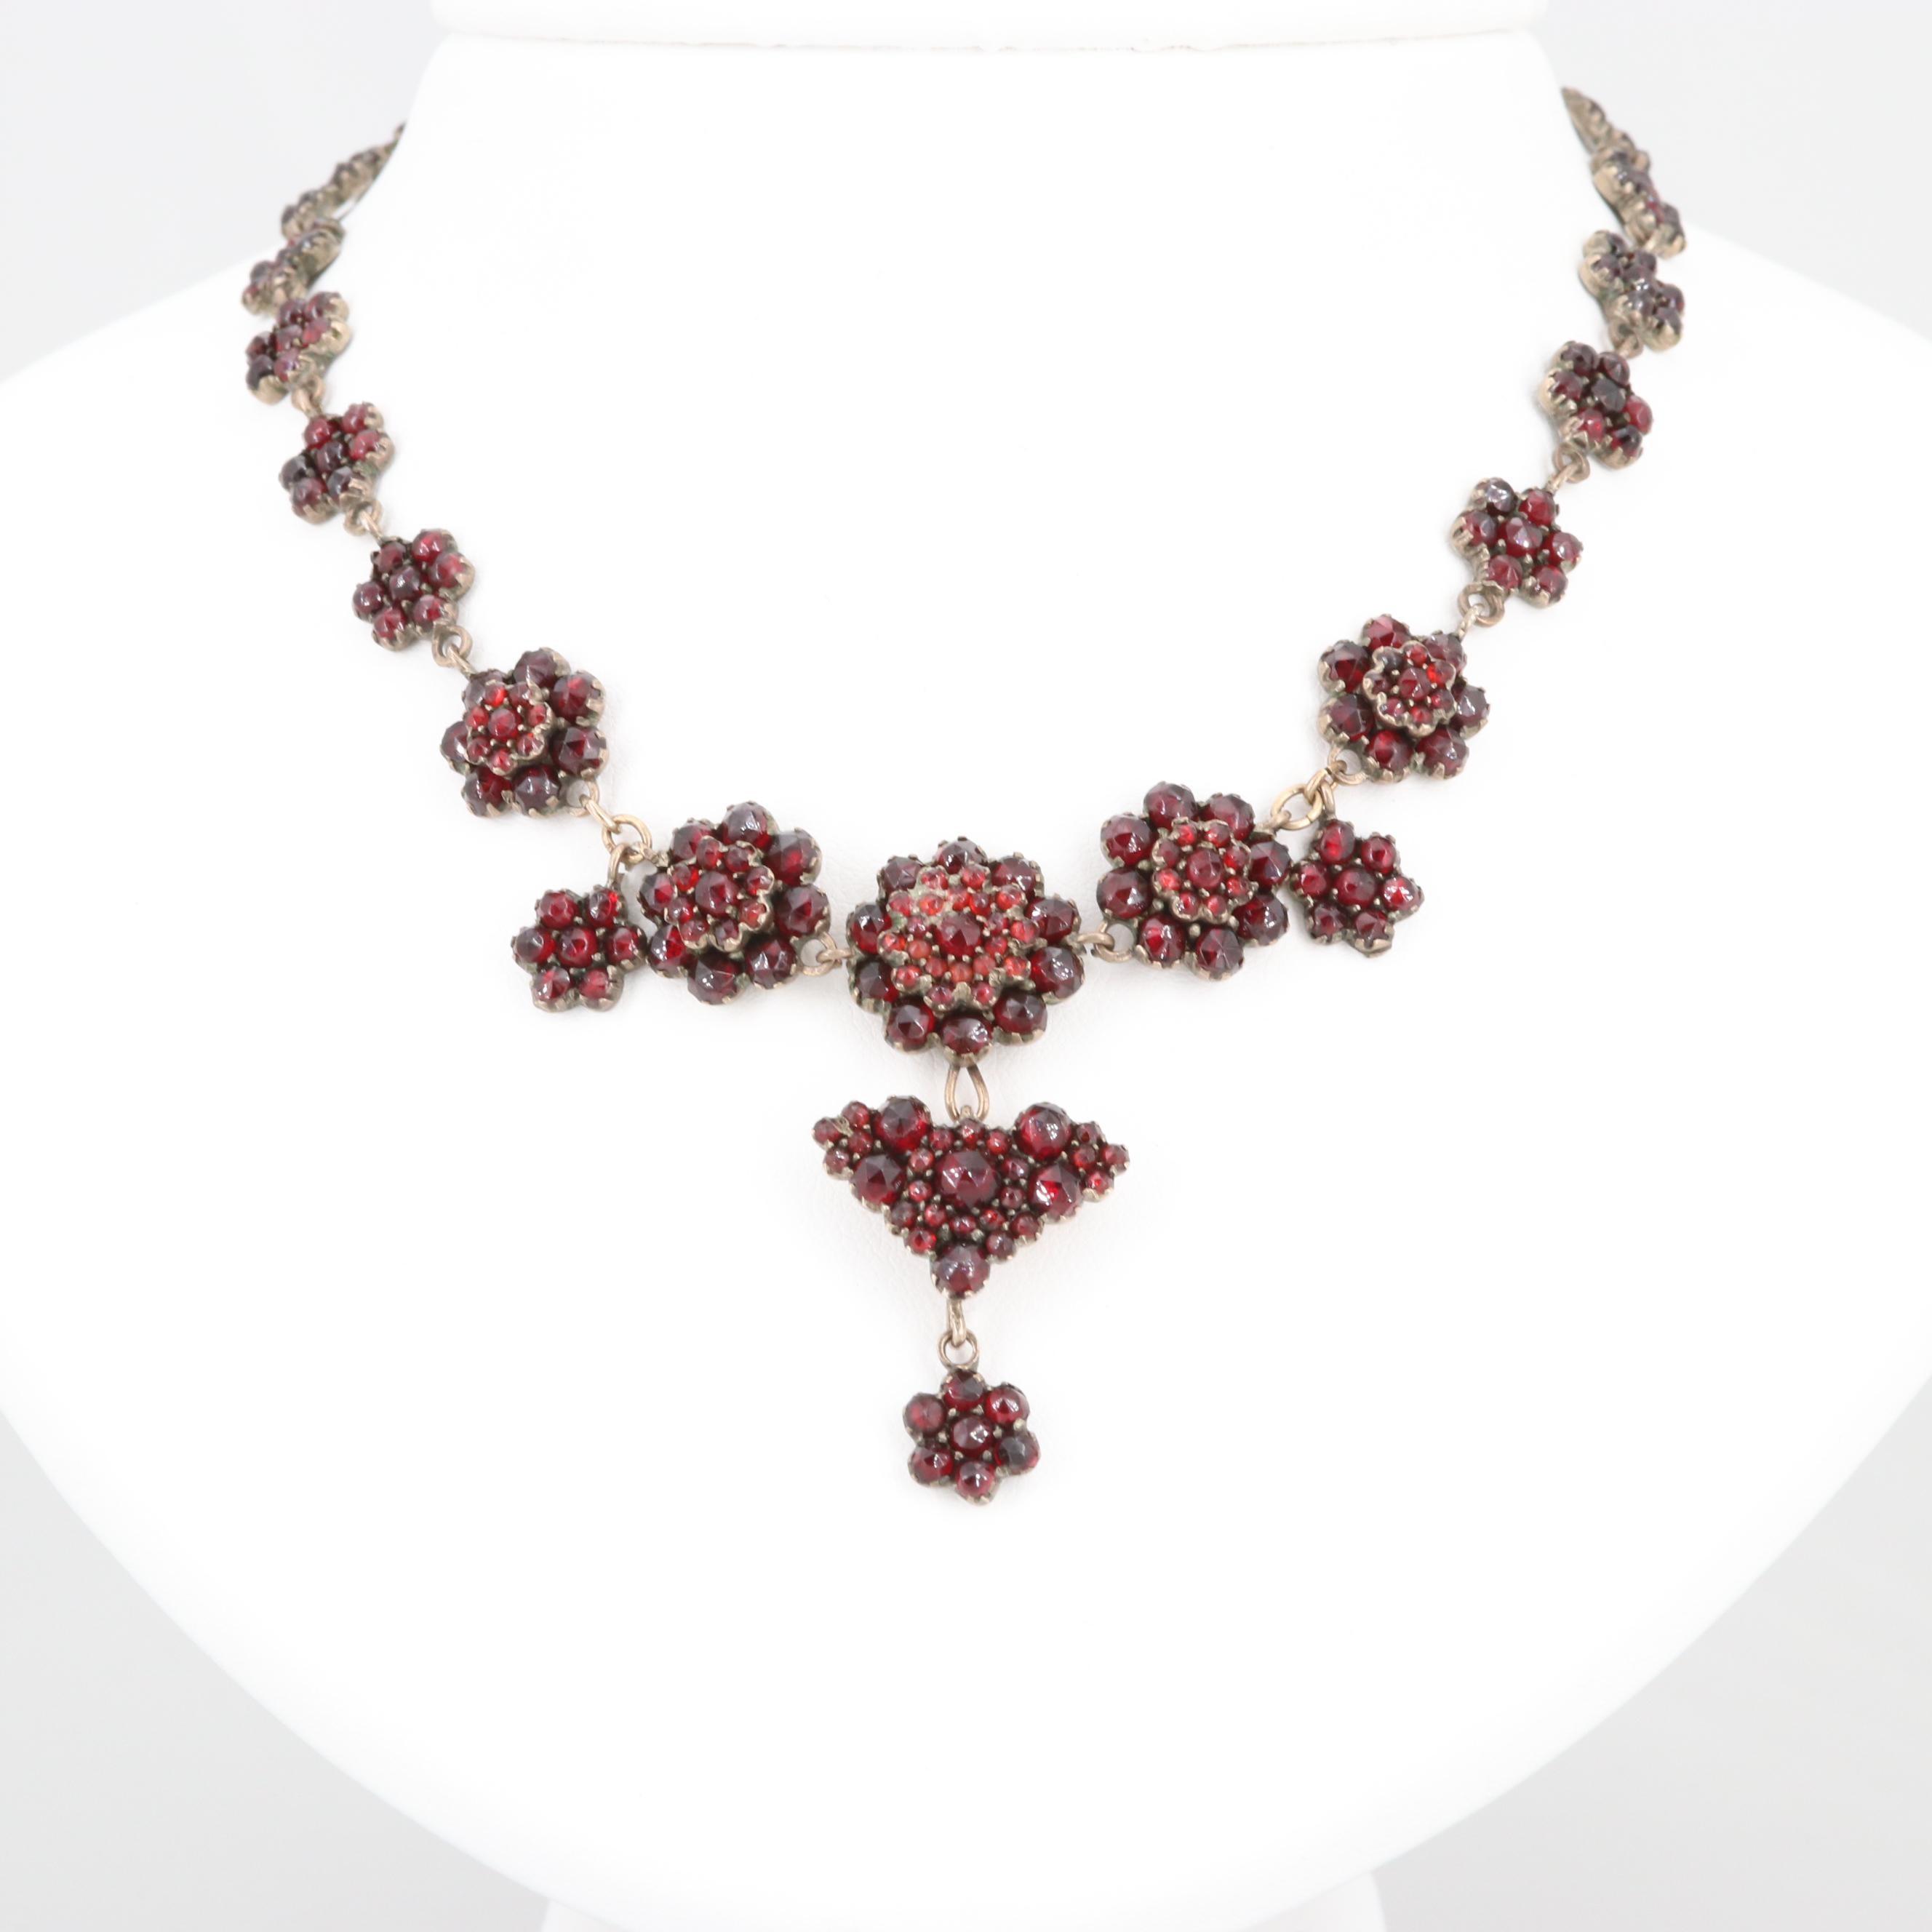 Early 1900s Bohemian Silver Tone Garnet Necklace